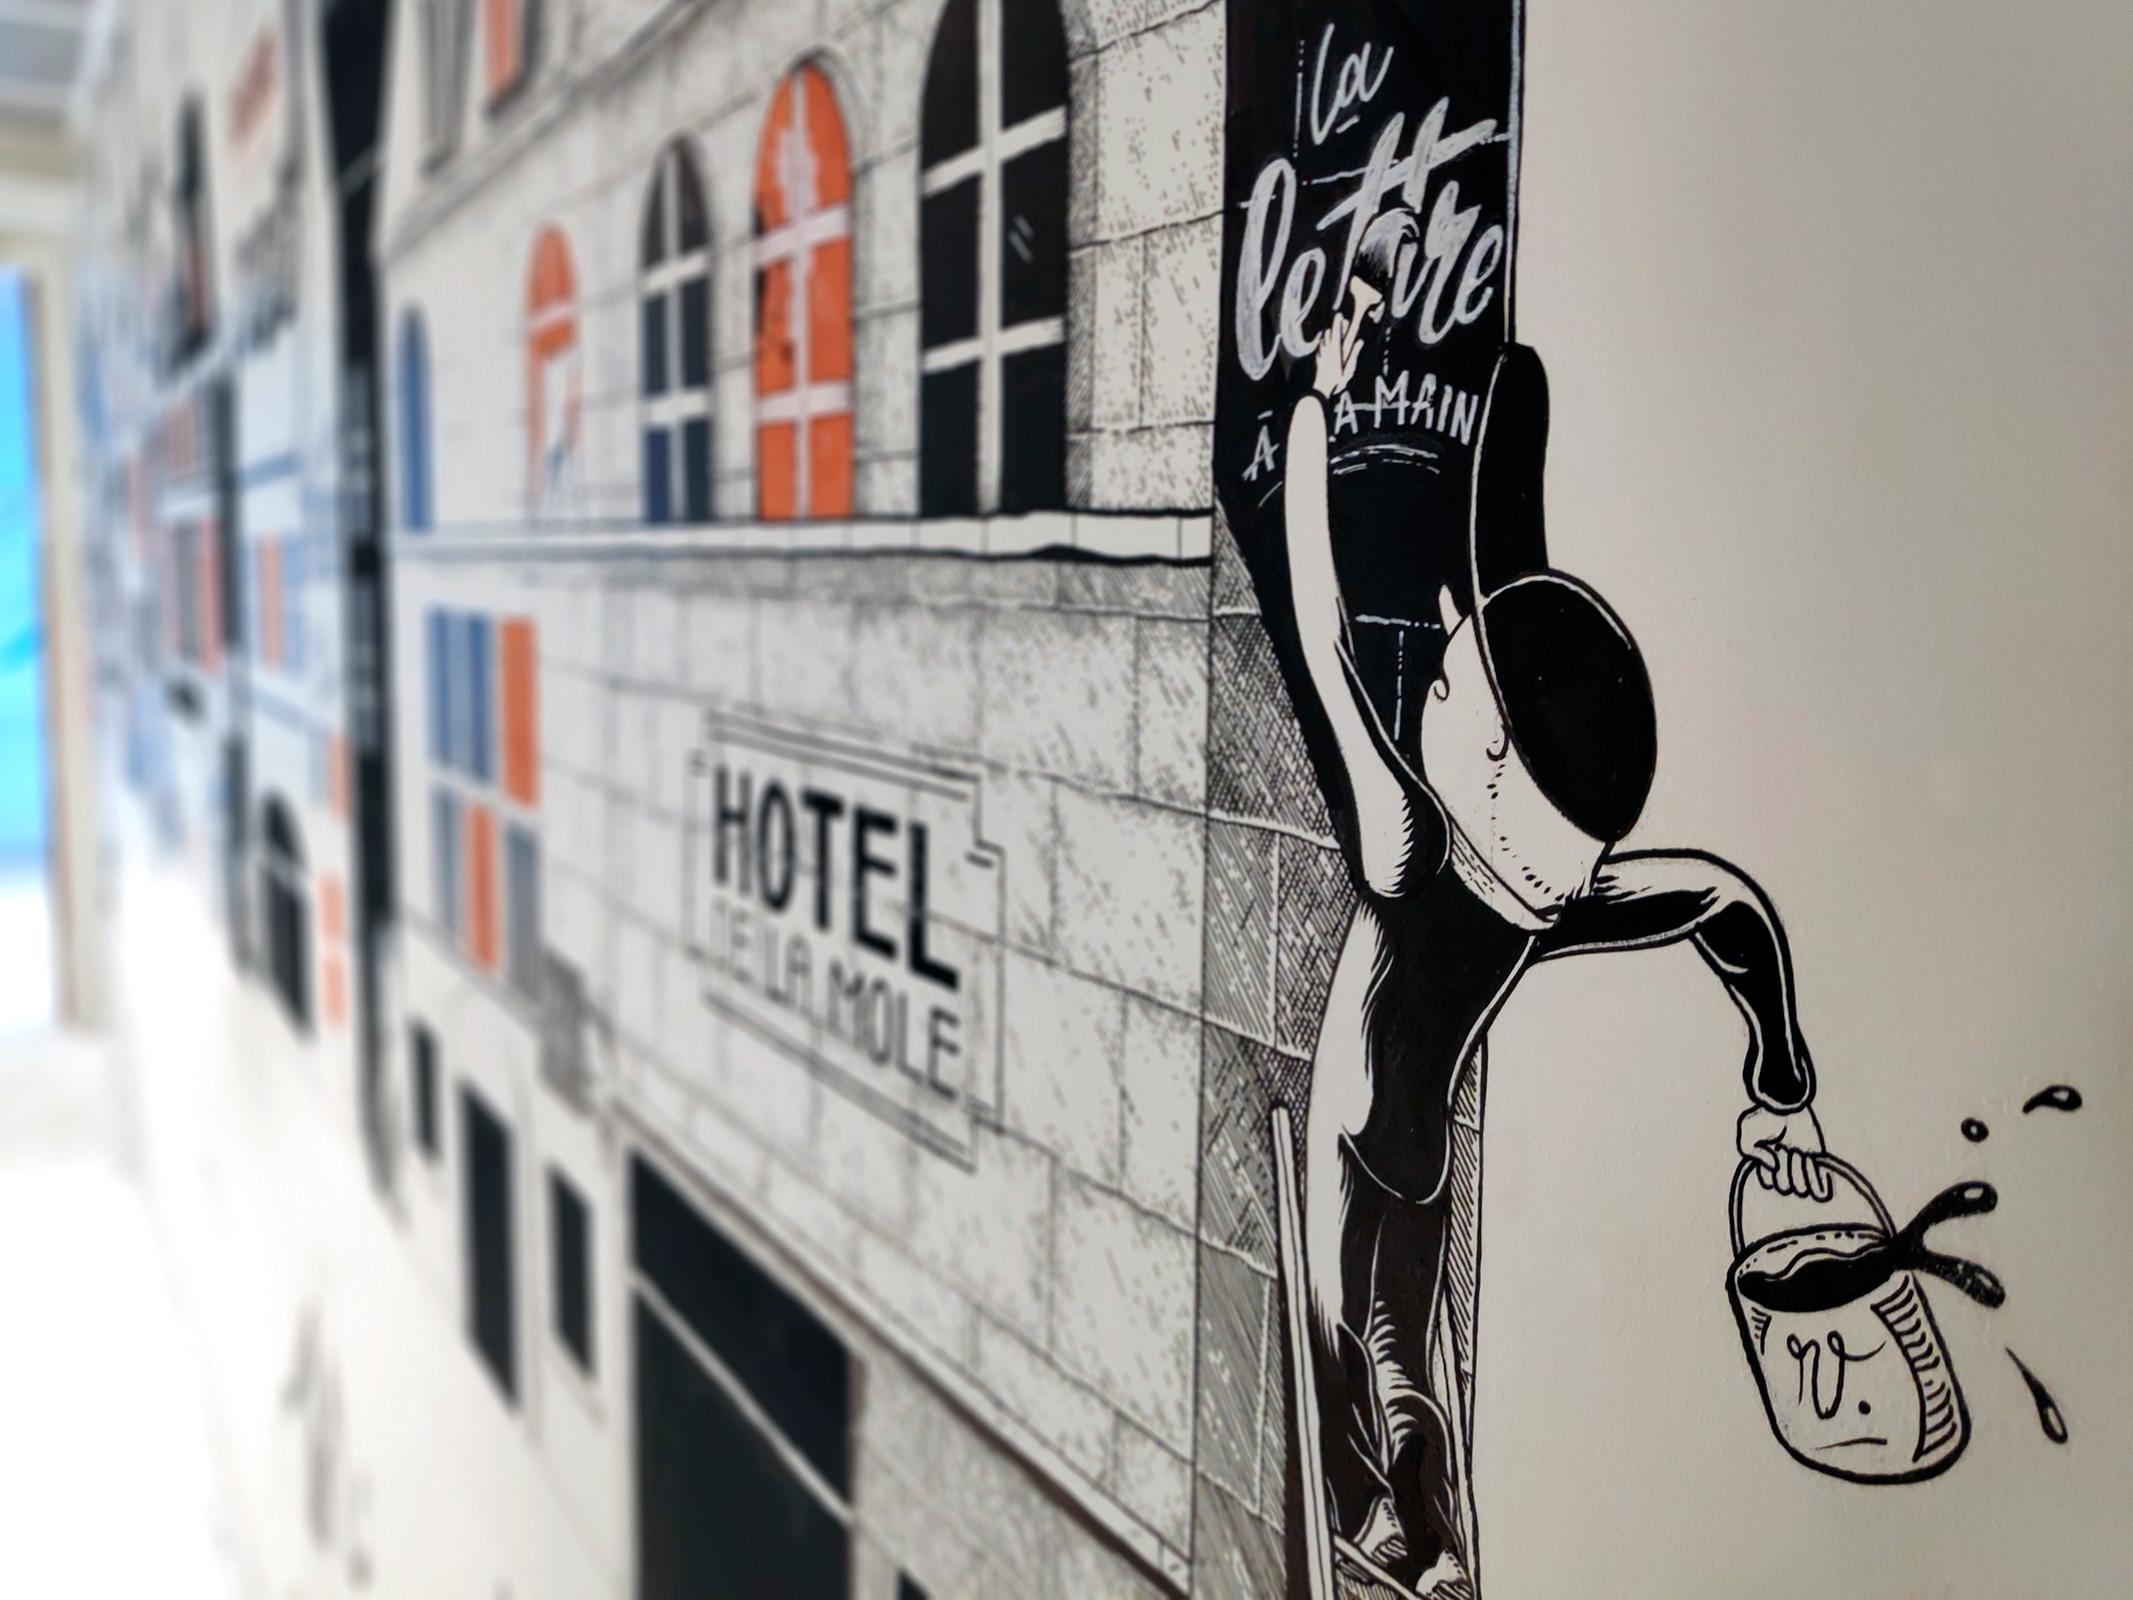 renaud_vigourt_stendhal_mural_0D